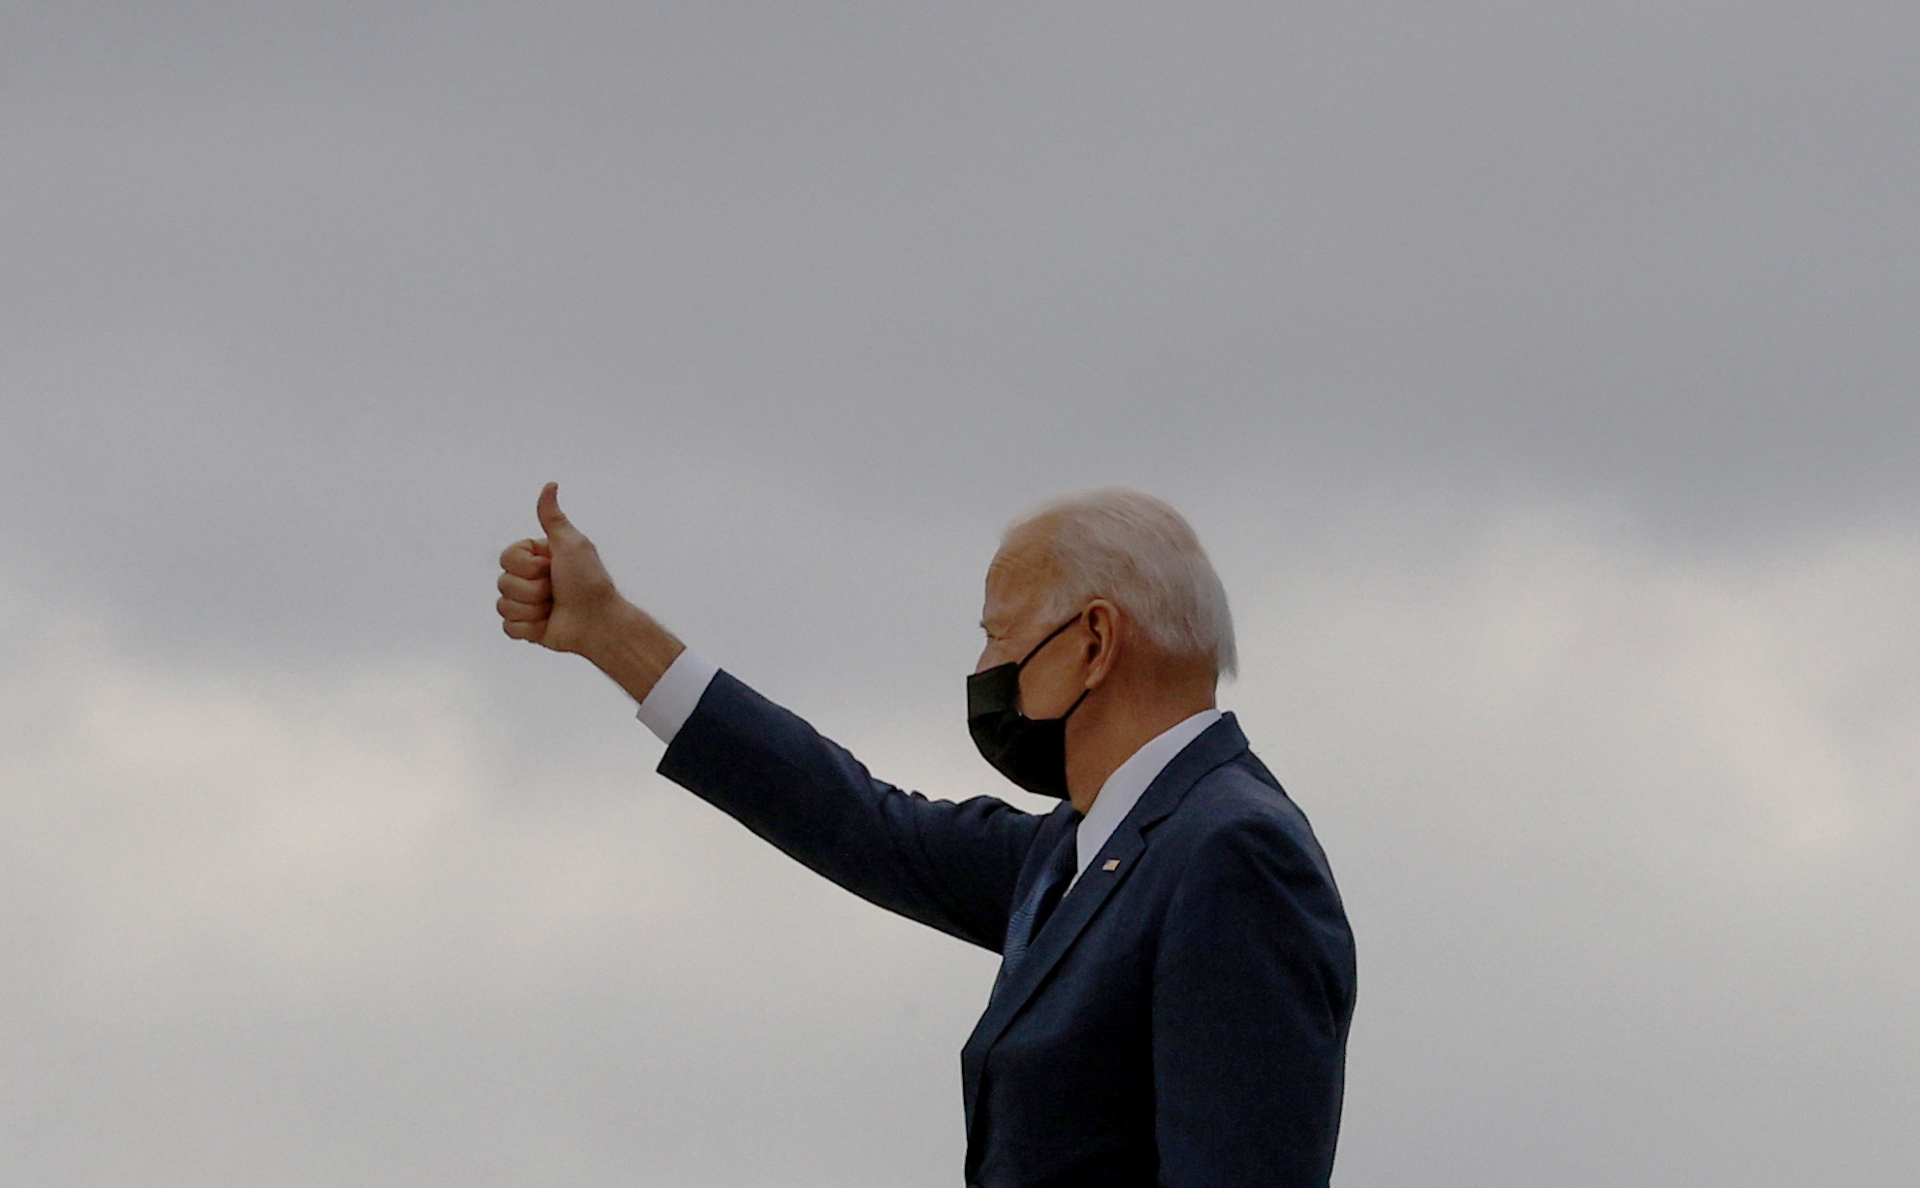 Байден представил план по развитию инфраструктуры на $2 трлн